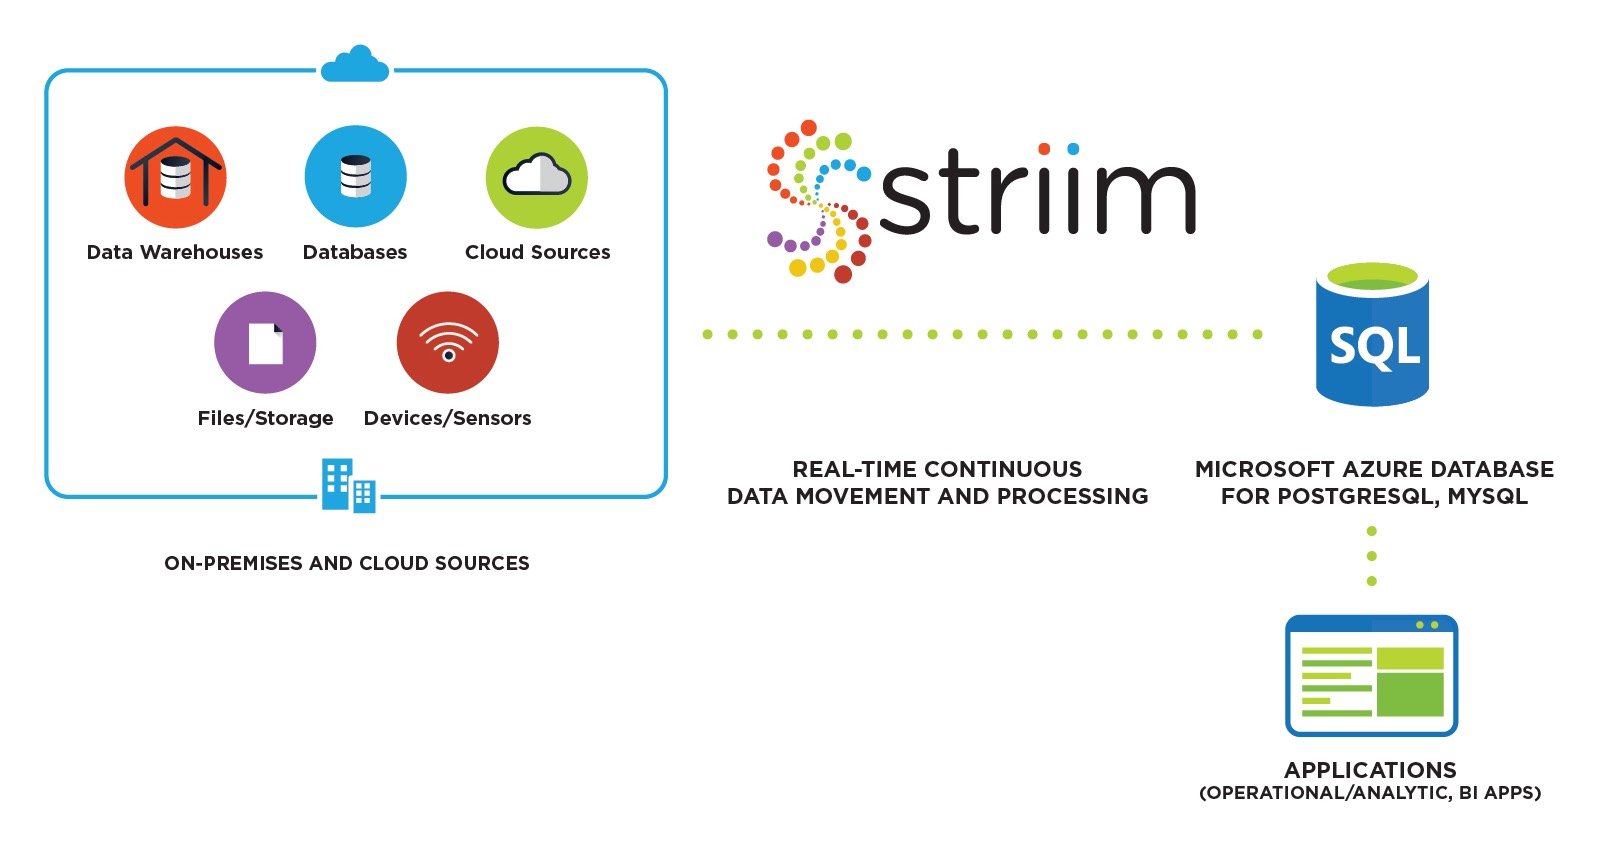 Striim for Azure PostgreSQL, MySQL